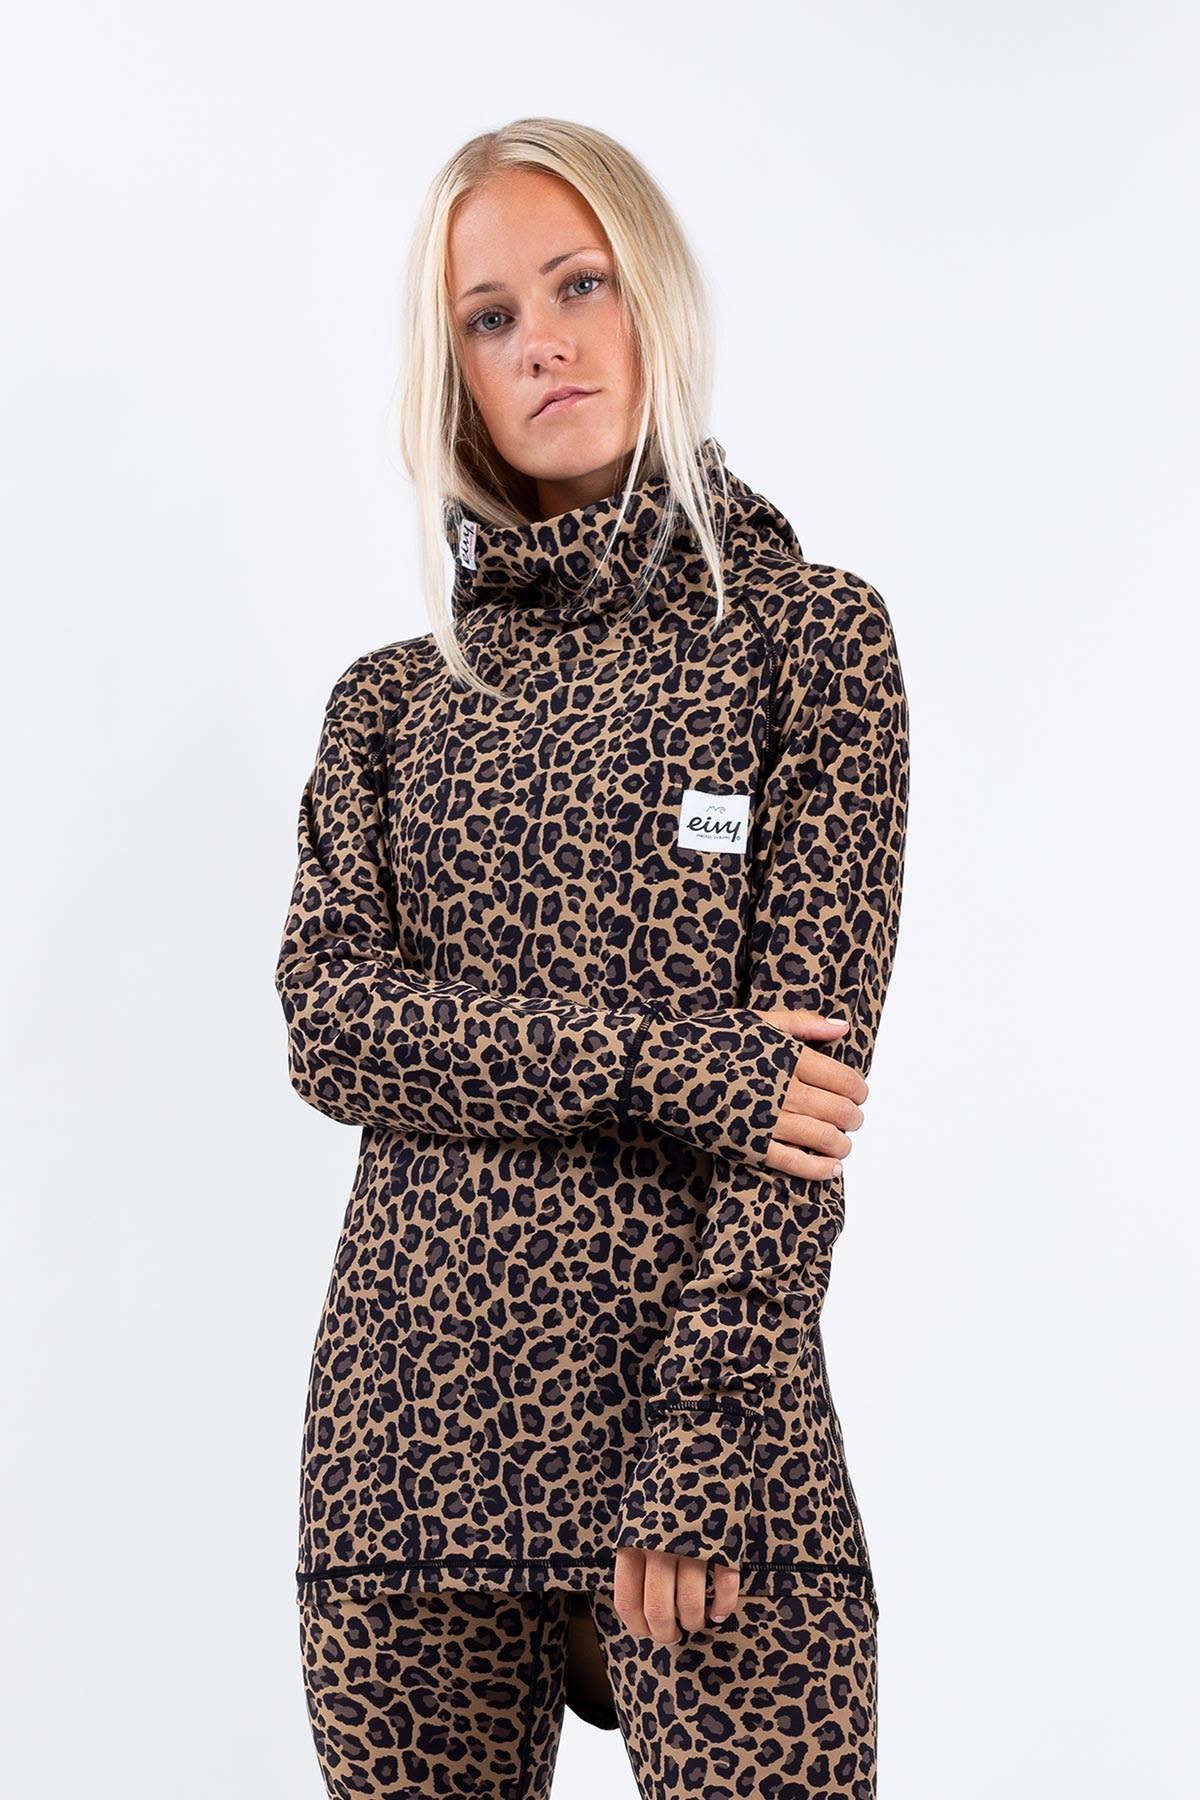 Eivy Eivy Women's Icecold Hood Top